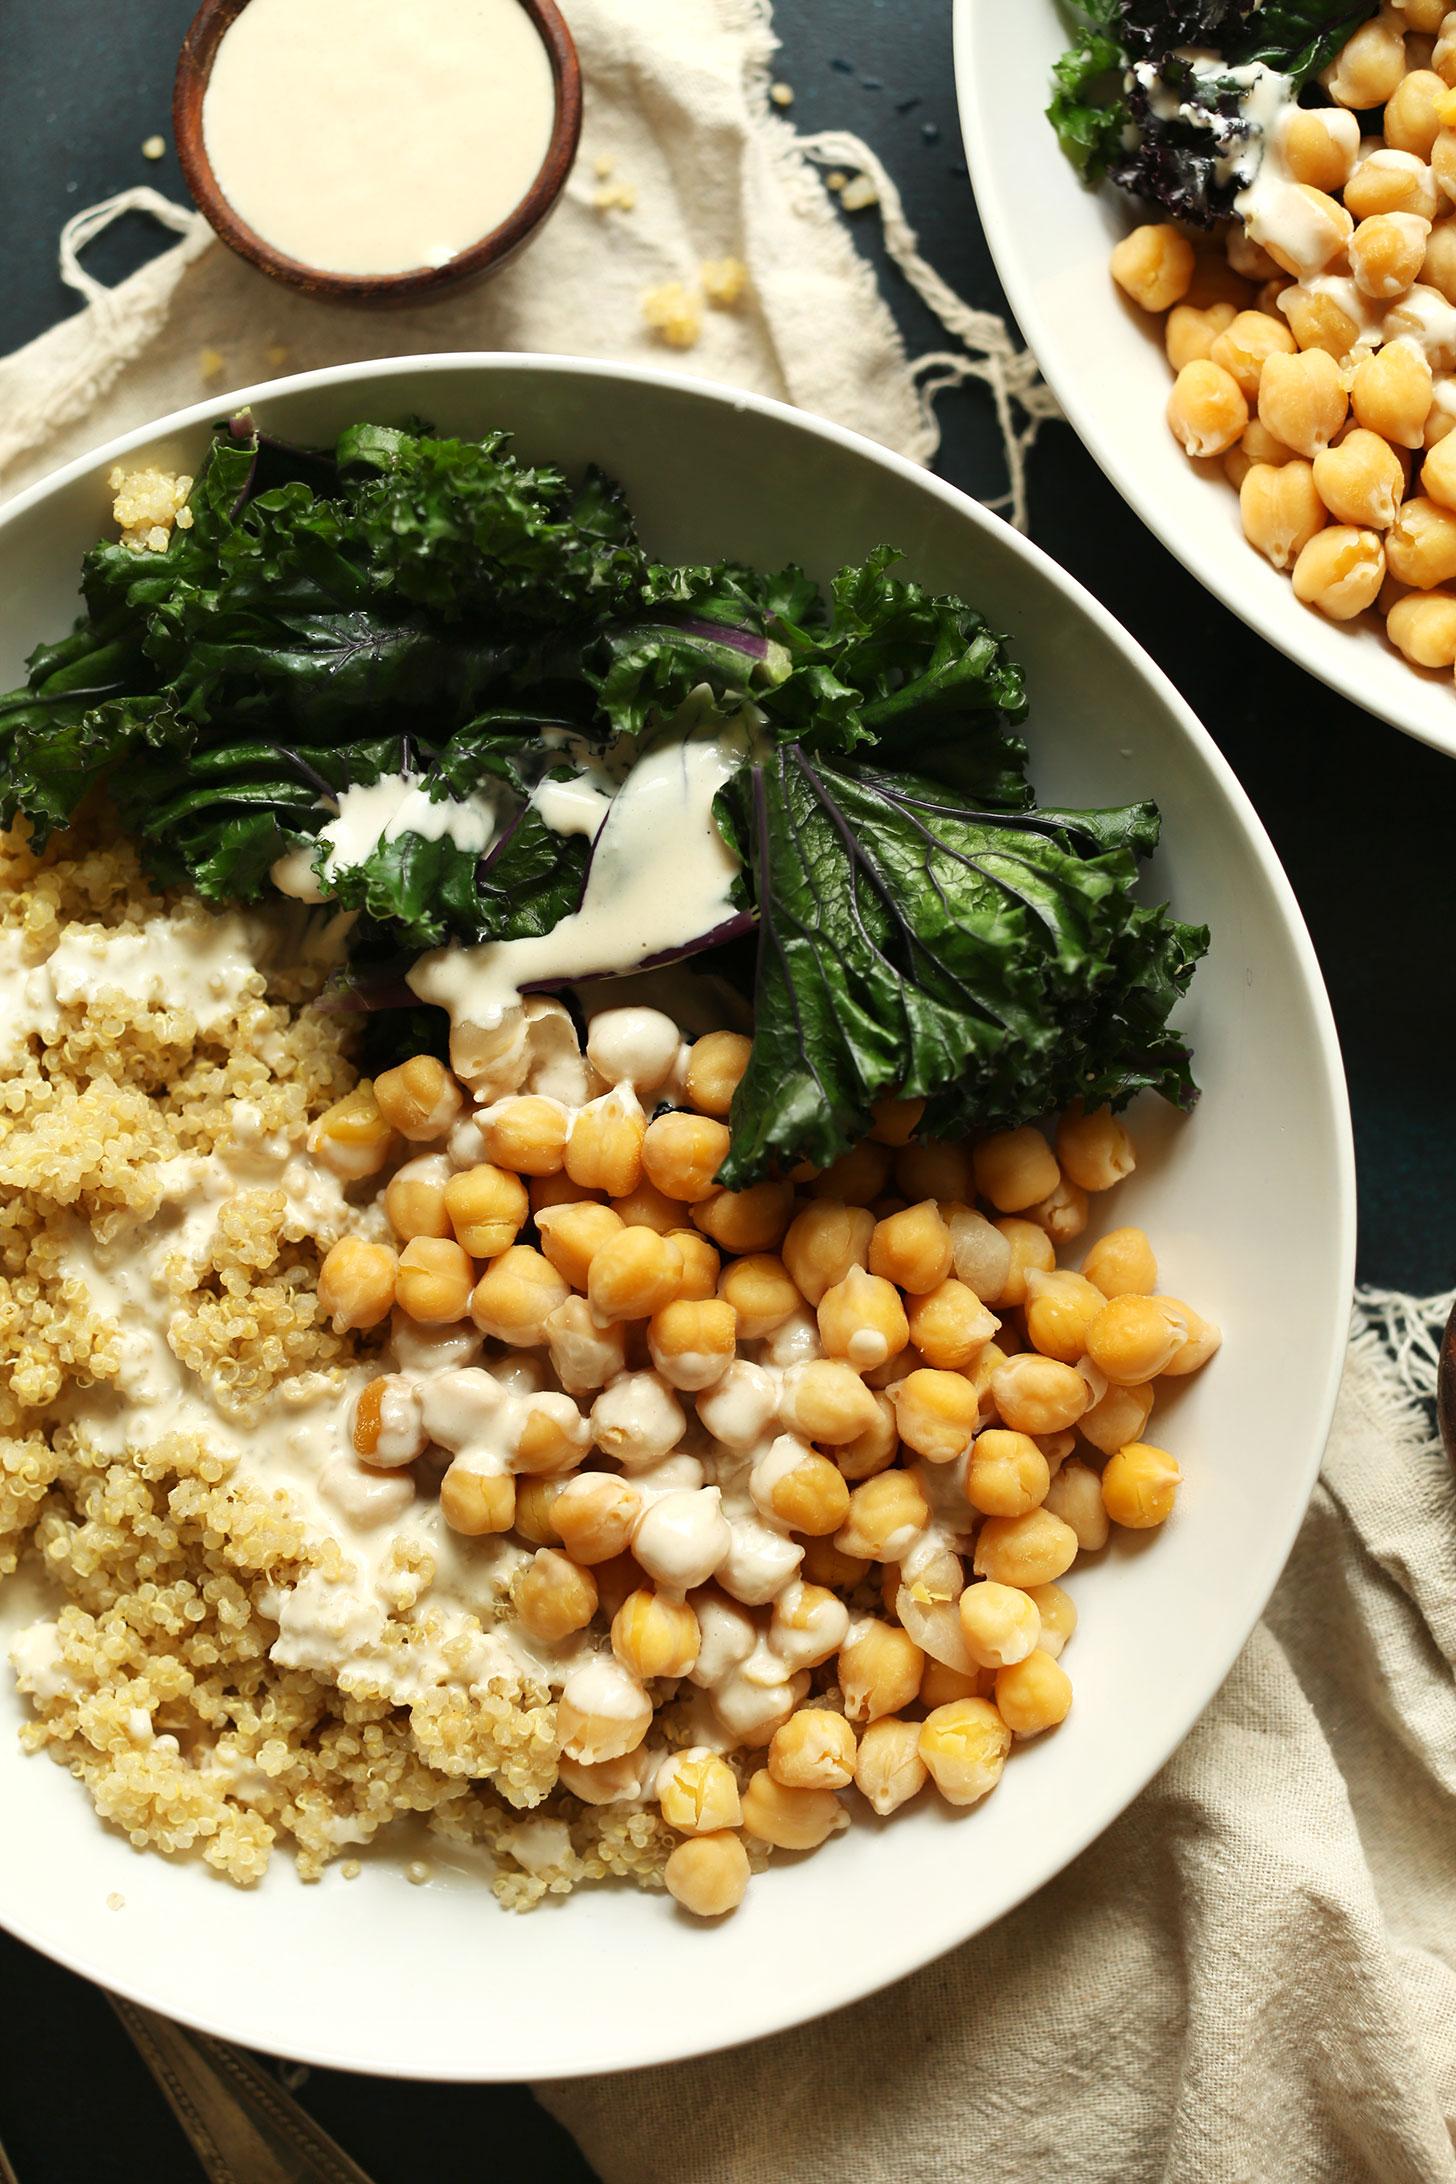 http://minimalistbaker.com/quinoa-chickpea-buddha-bowl/